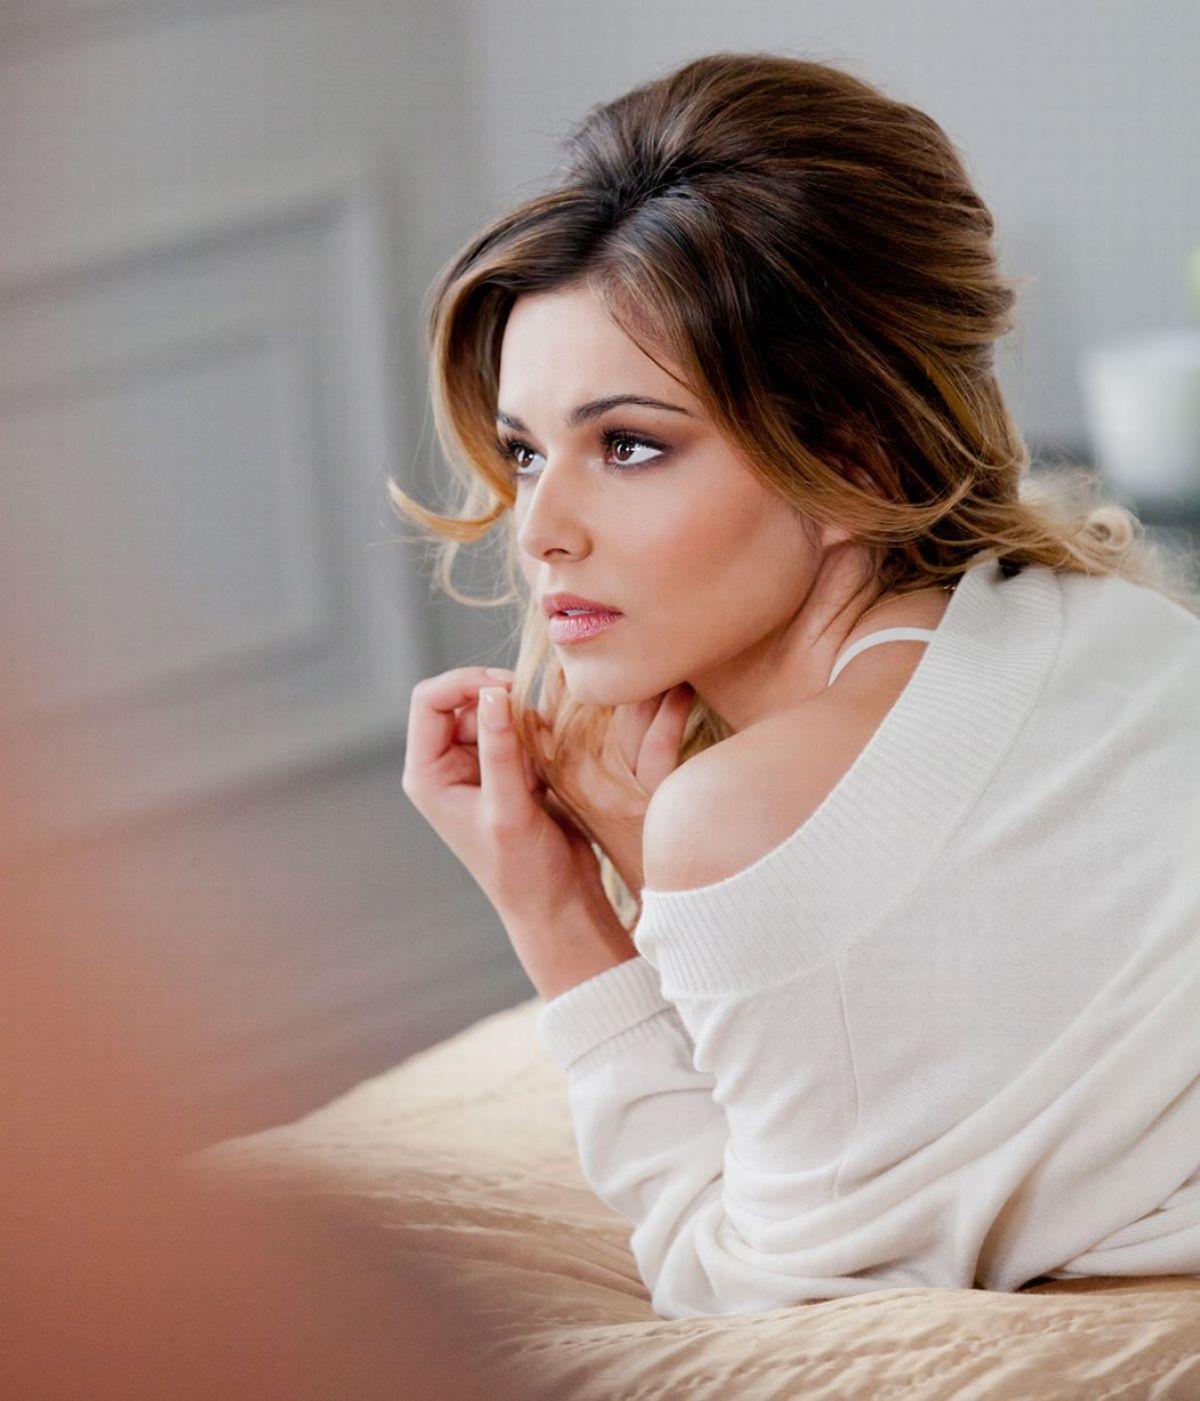 Cheryl Cole L'Oreal Paris Elnett Satin Hairspray Photoshoot